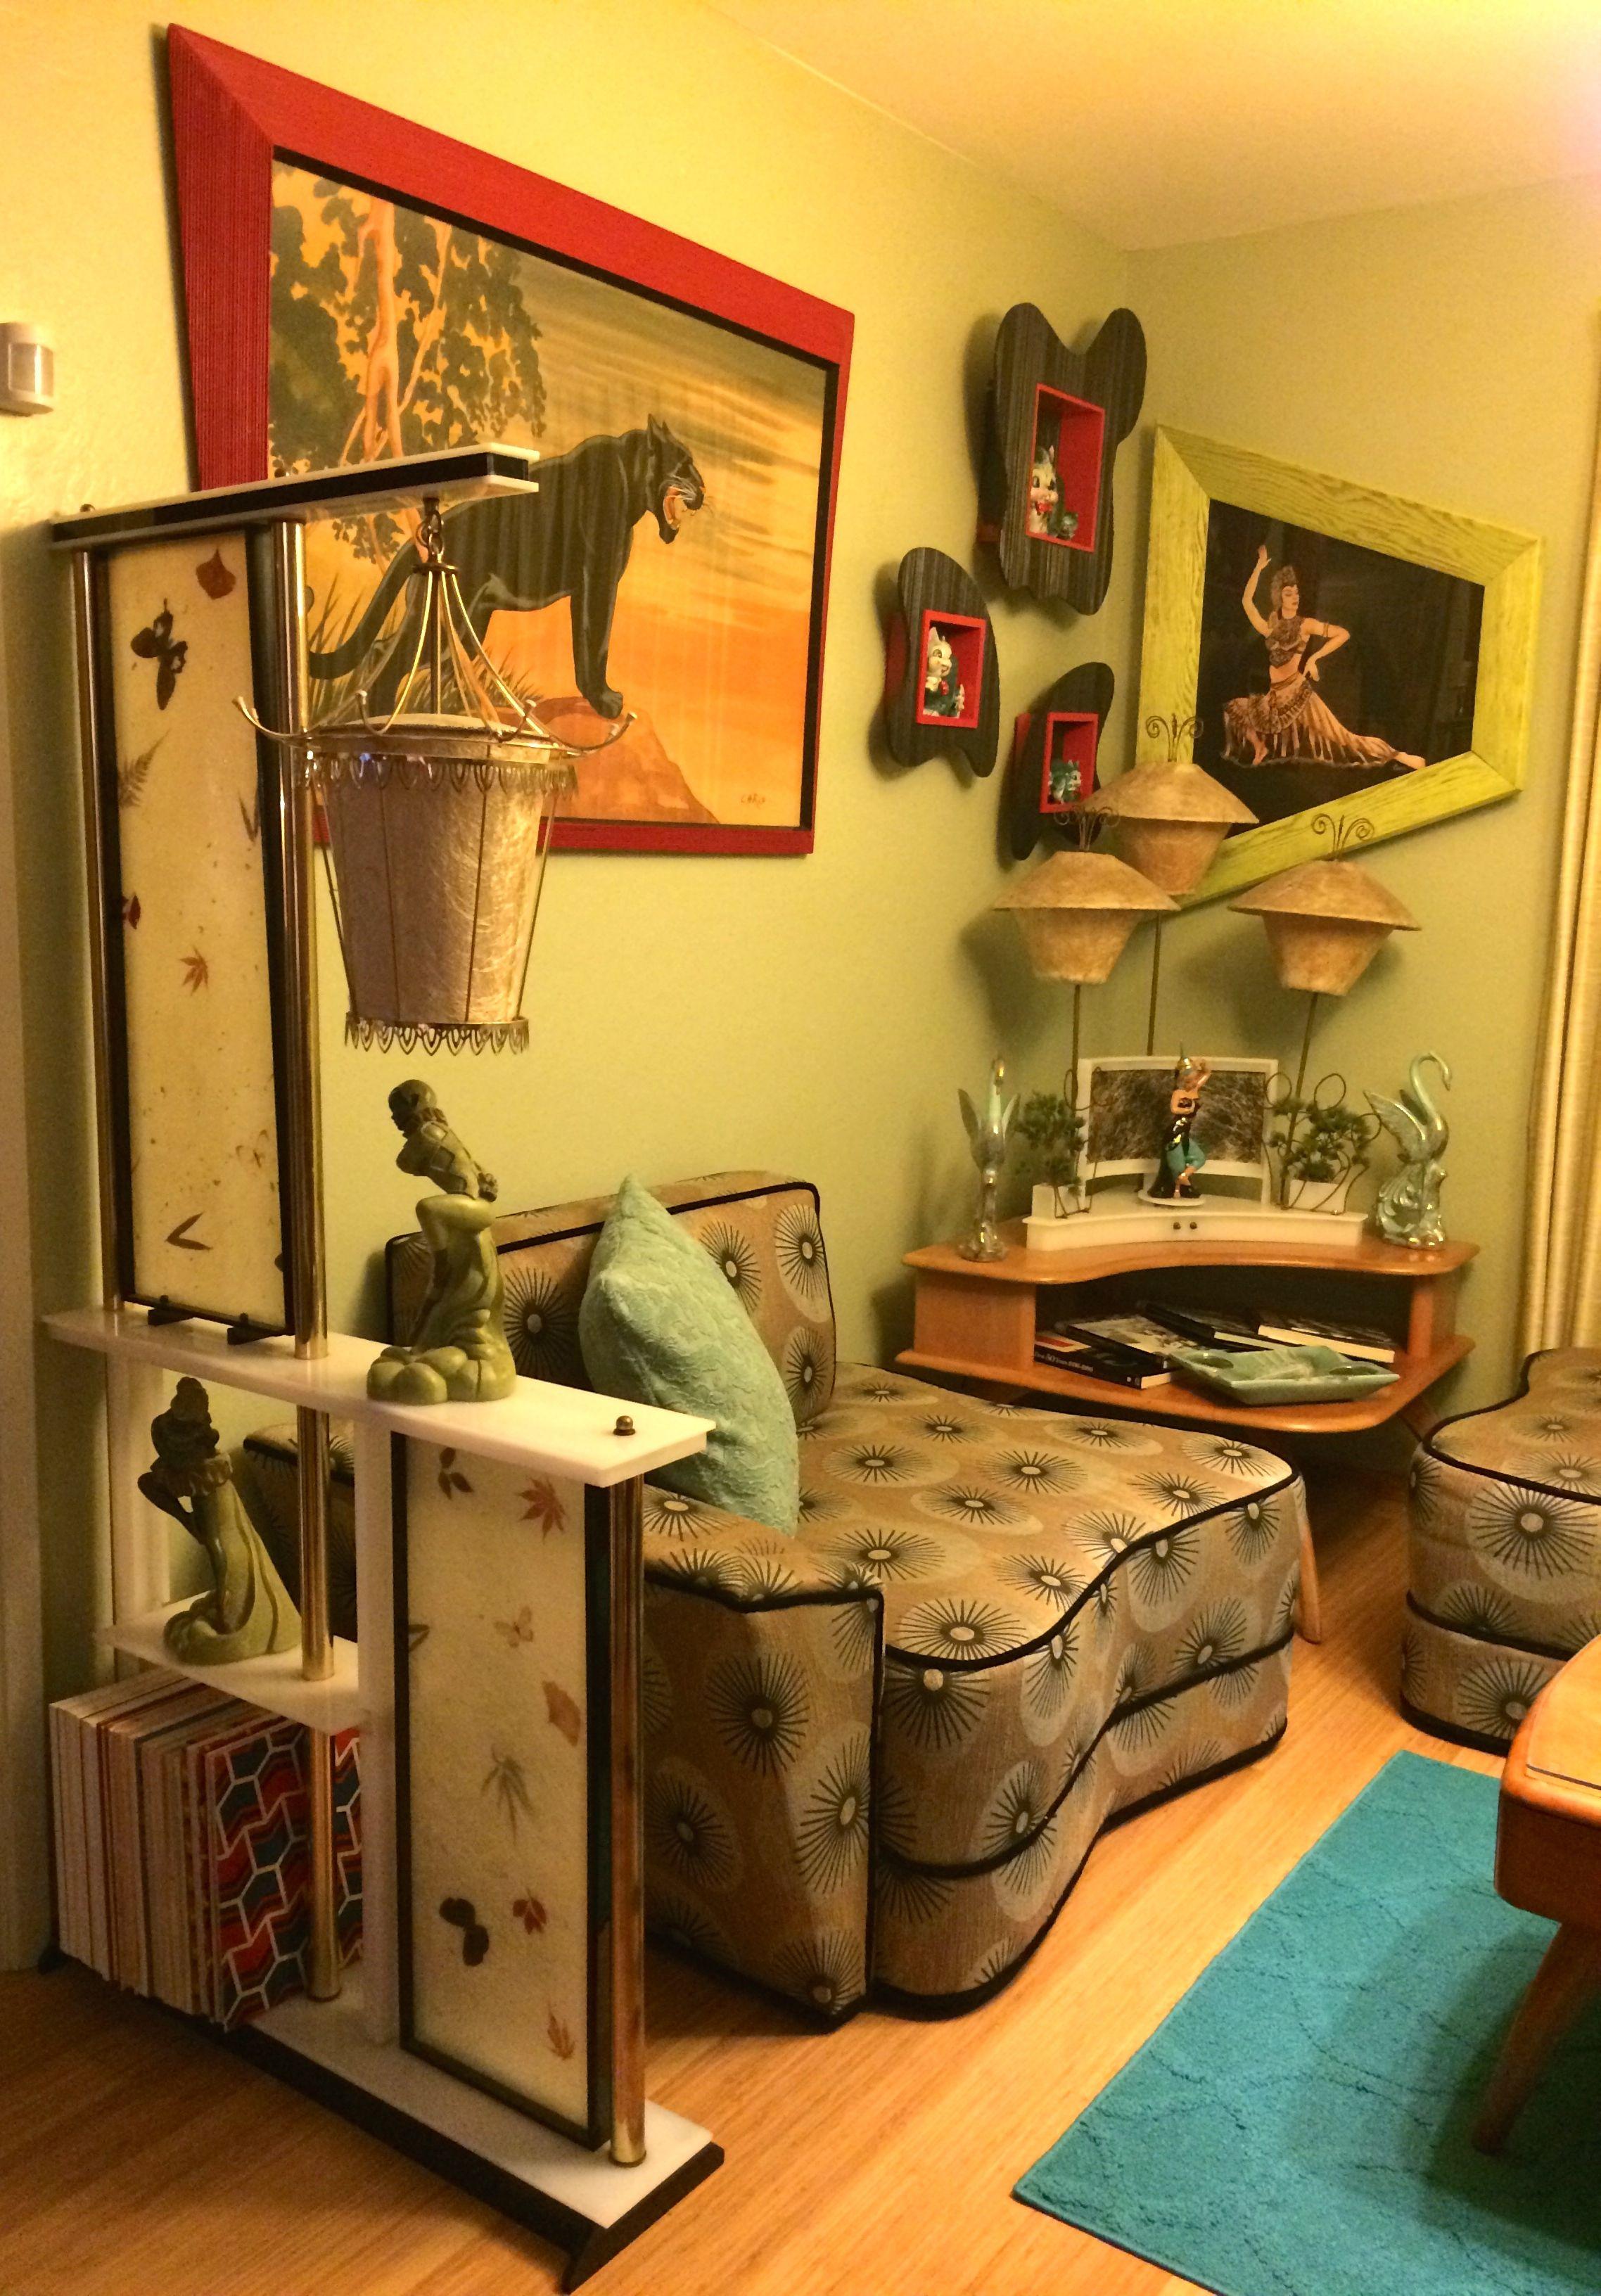 Carlo of Hollywood Paintings, Moss Room Divider, Heywood Wakefield Corner Table, Moss 3 Lampshade Spinner Lamp, Amoeba Chair & Amoeba Shadowboxes